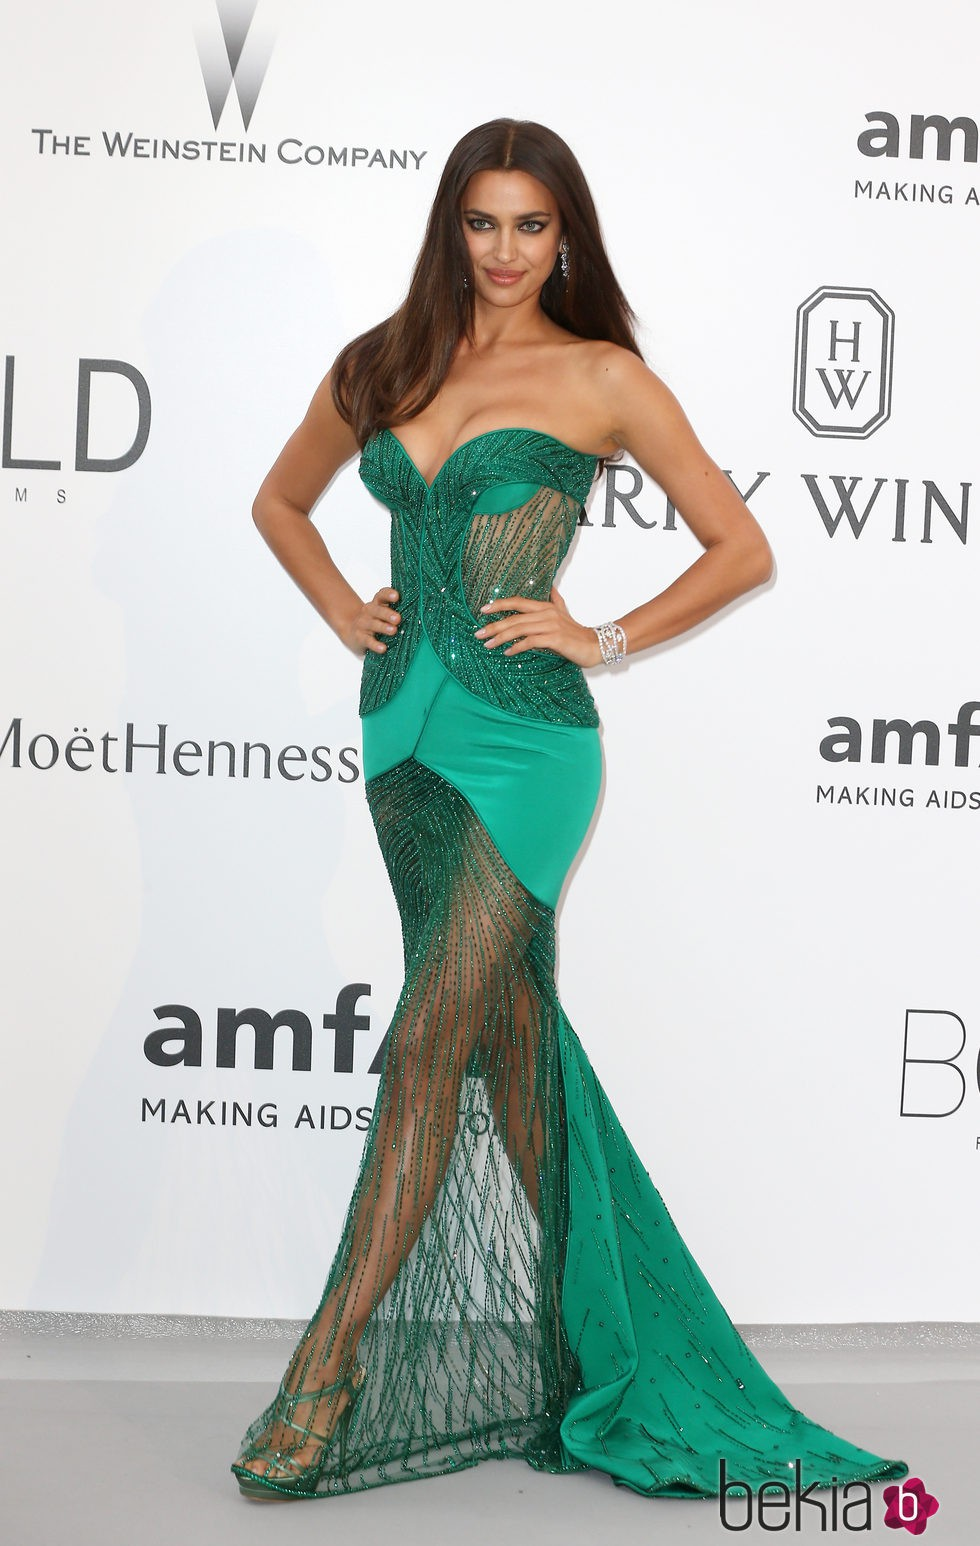 Irina Shayk en la gala amfAR del Festival de Cannes 2015